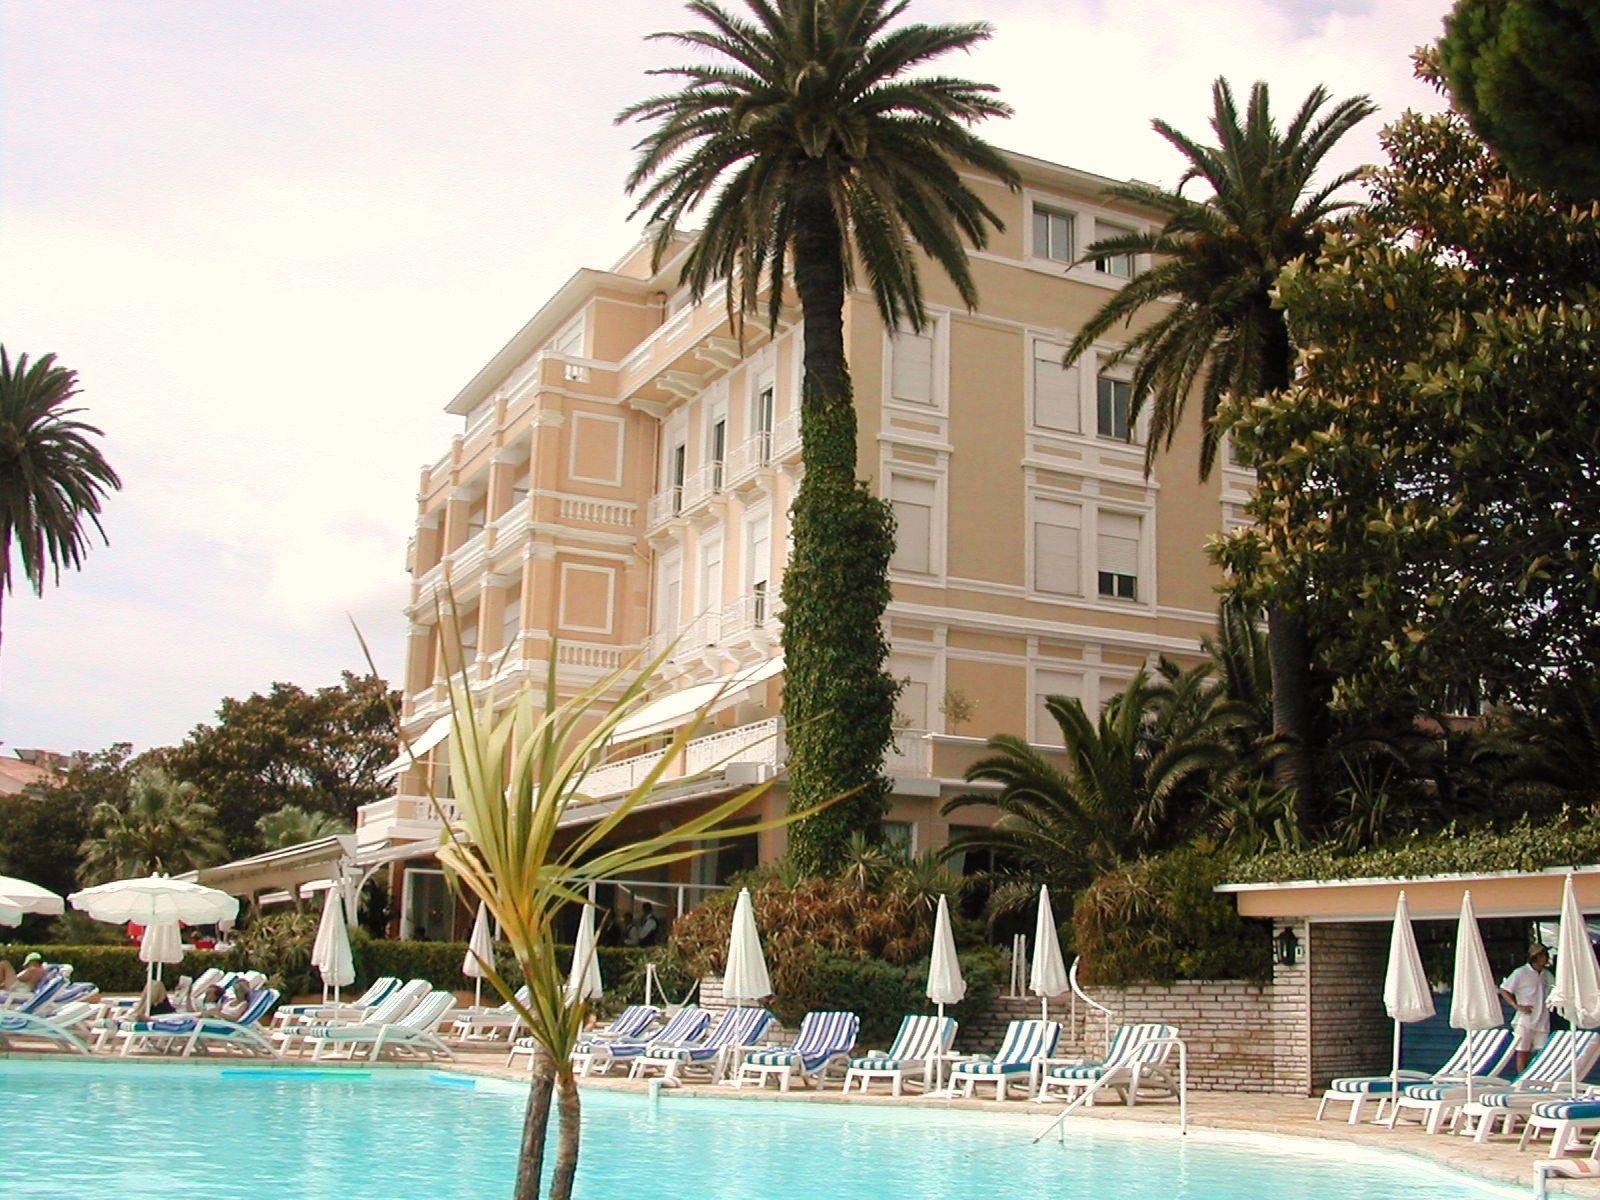 Hotel Mtropole Beaulieu sur Mer unfortunately no more